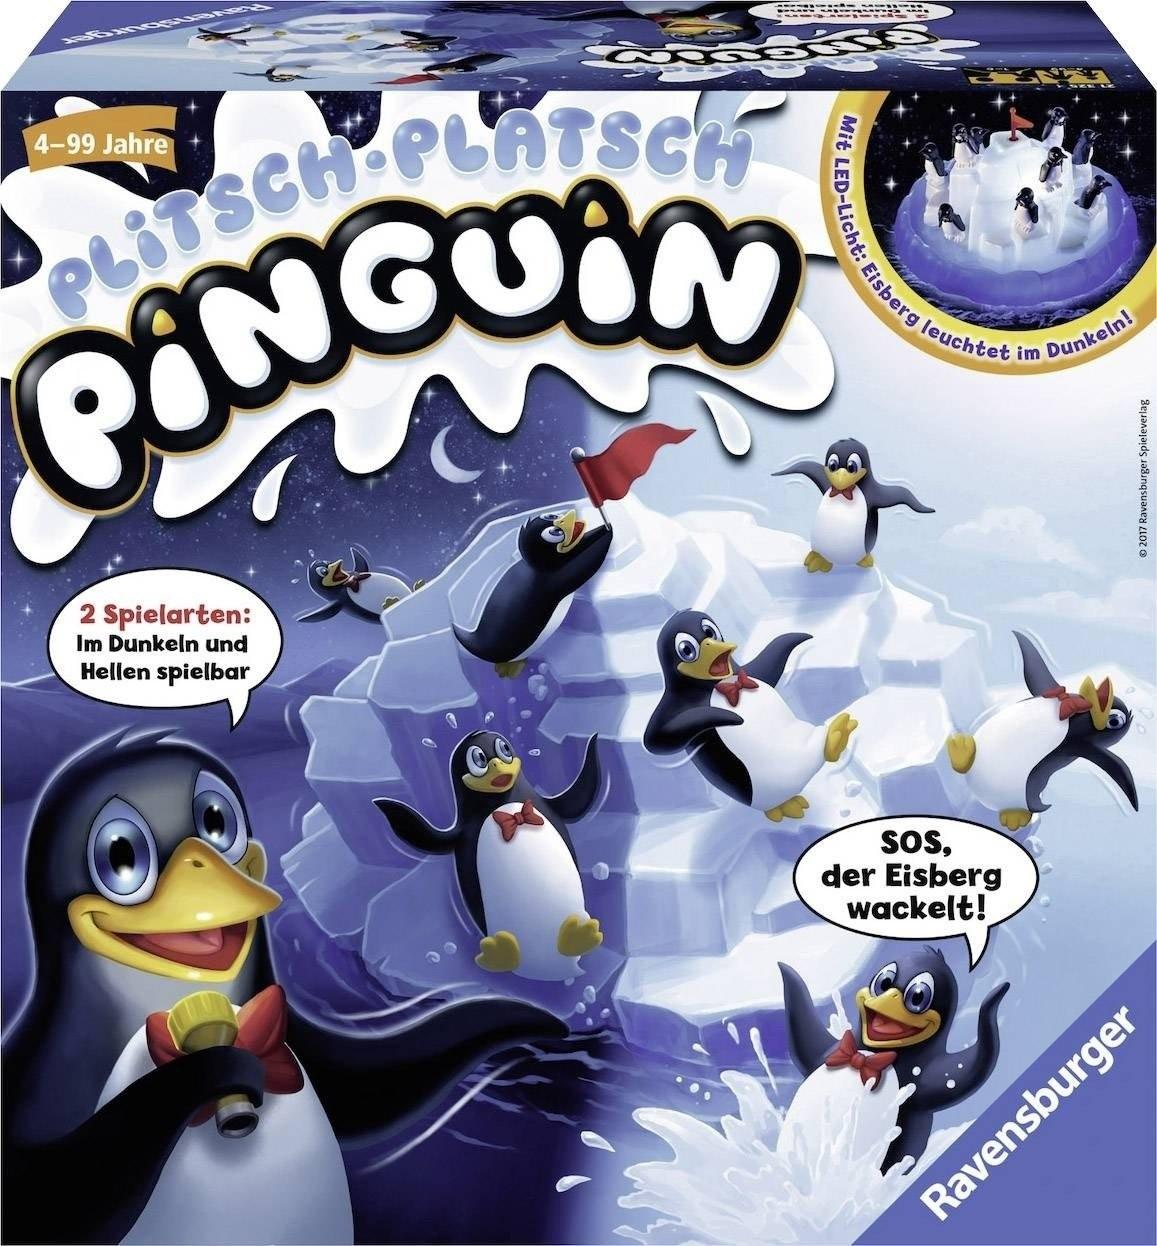 Ravensburger Plitsch-Platsch Pinguin ´17 (21325)